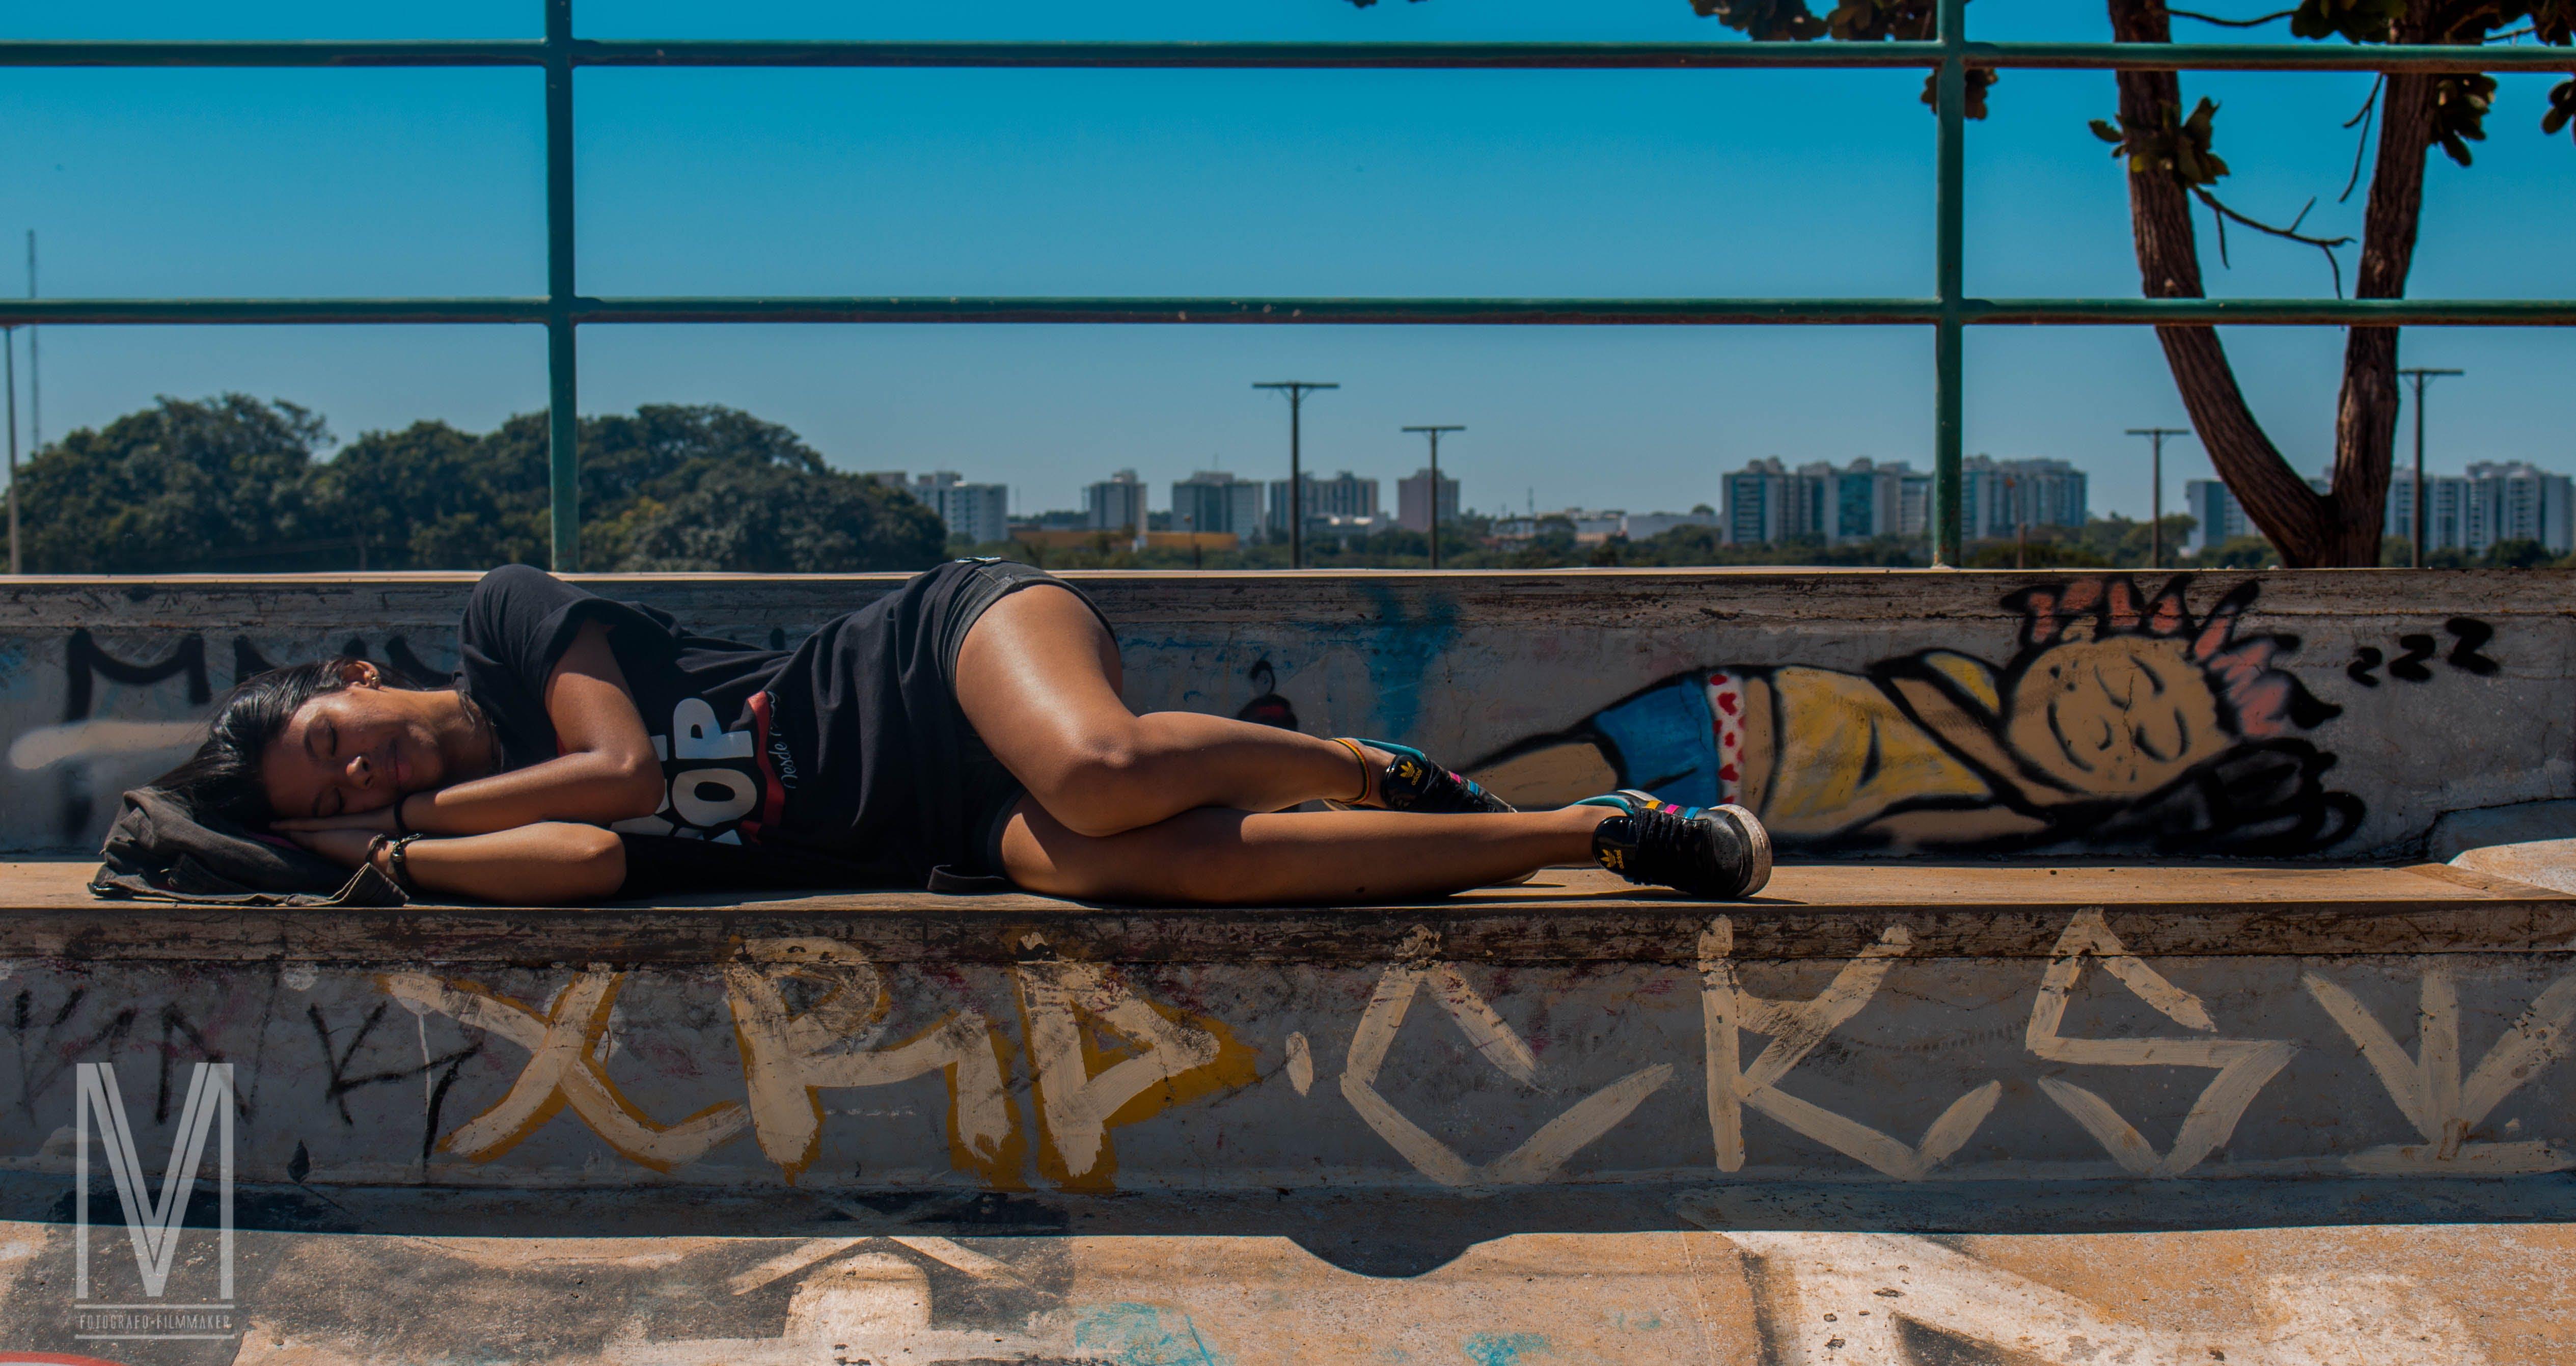 asleep, graffiti, skatepark